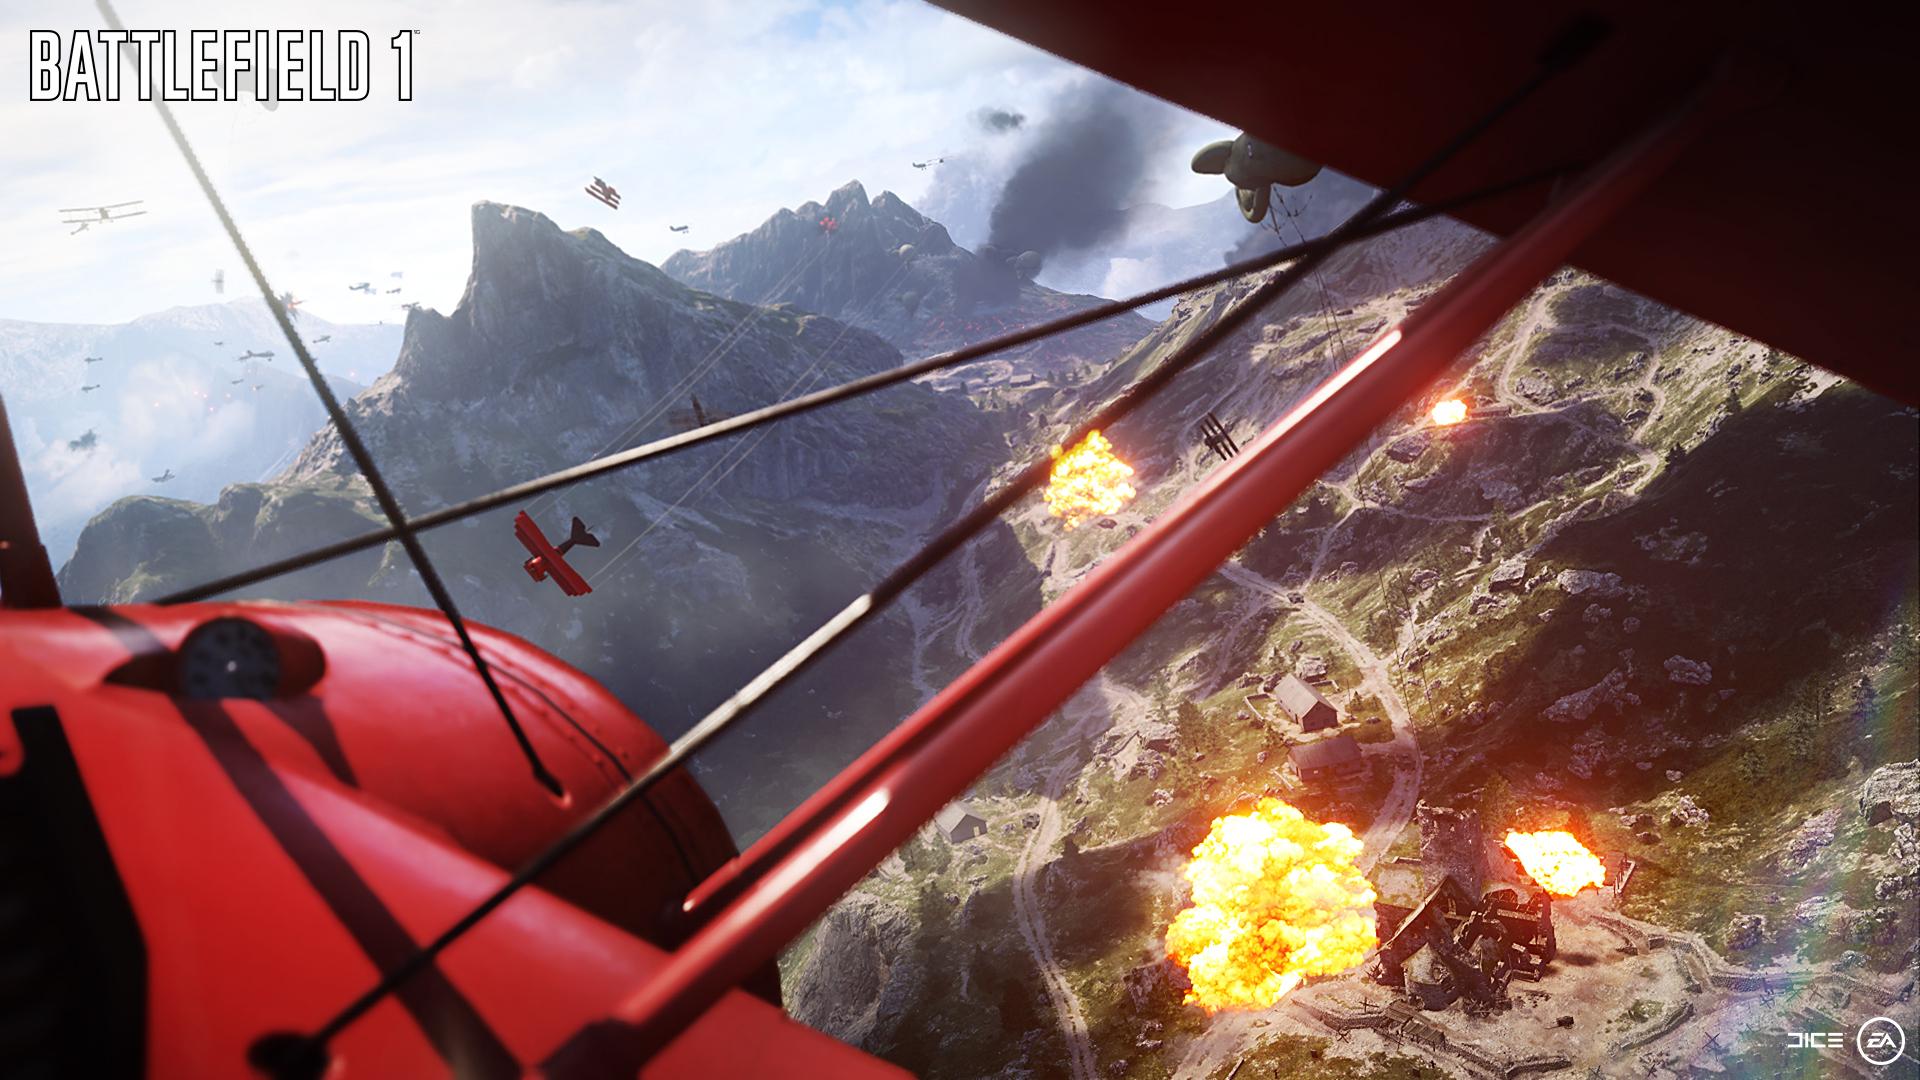 Battlefield 4 Full Hd Fond D écran And Arrière Plan: Wallpapers Battlefield 1